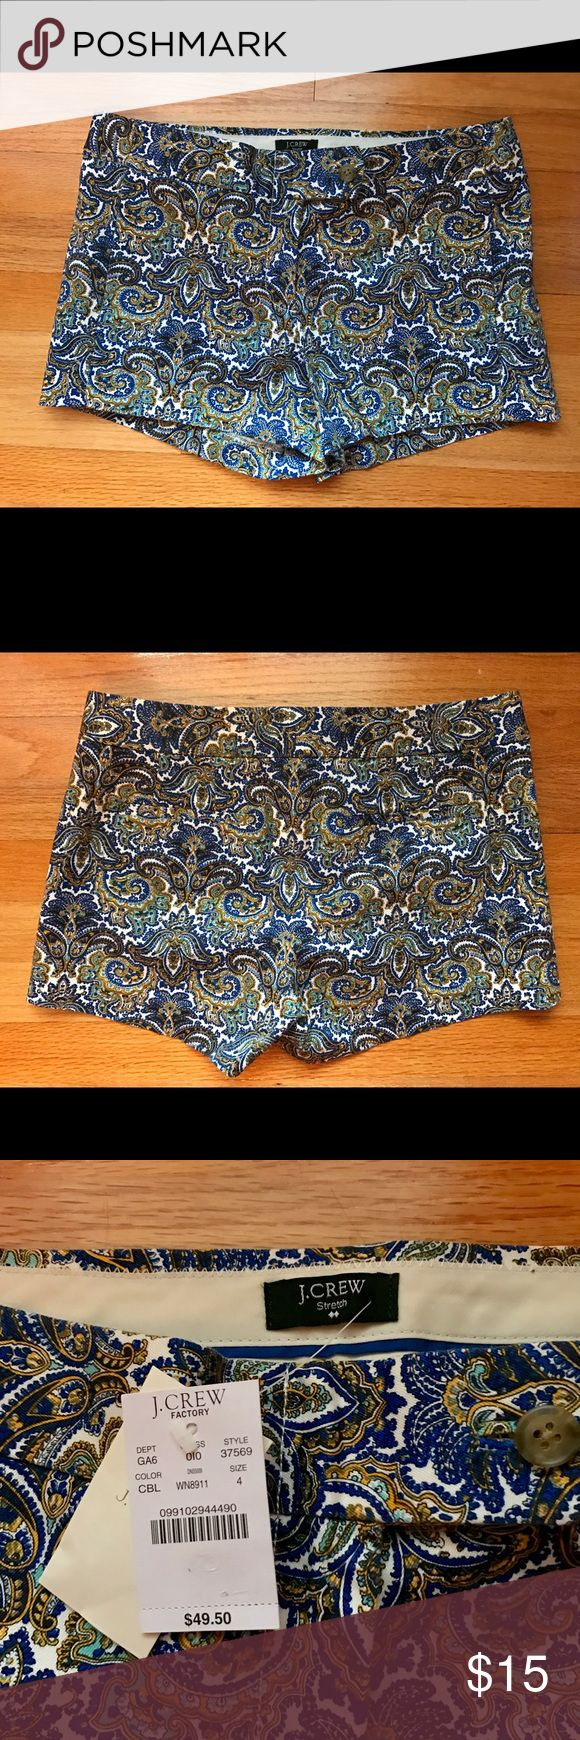 J. Crew Chino Shorts J. Crew Chino Shorts in paisley print. Sits just above hip. Zipper and metal slide closure. J. Crew Shorts